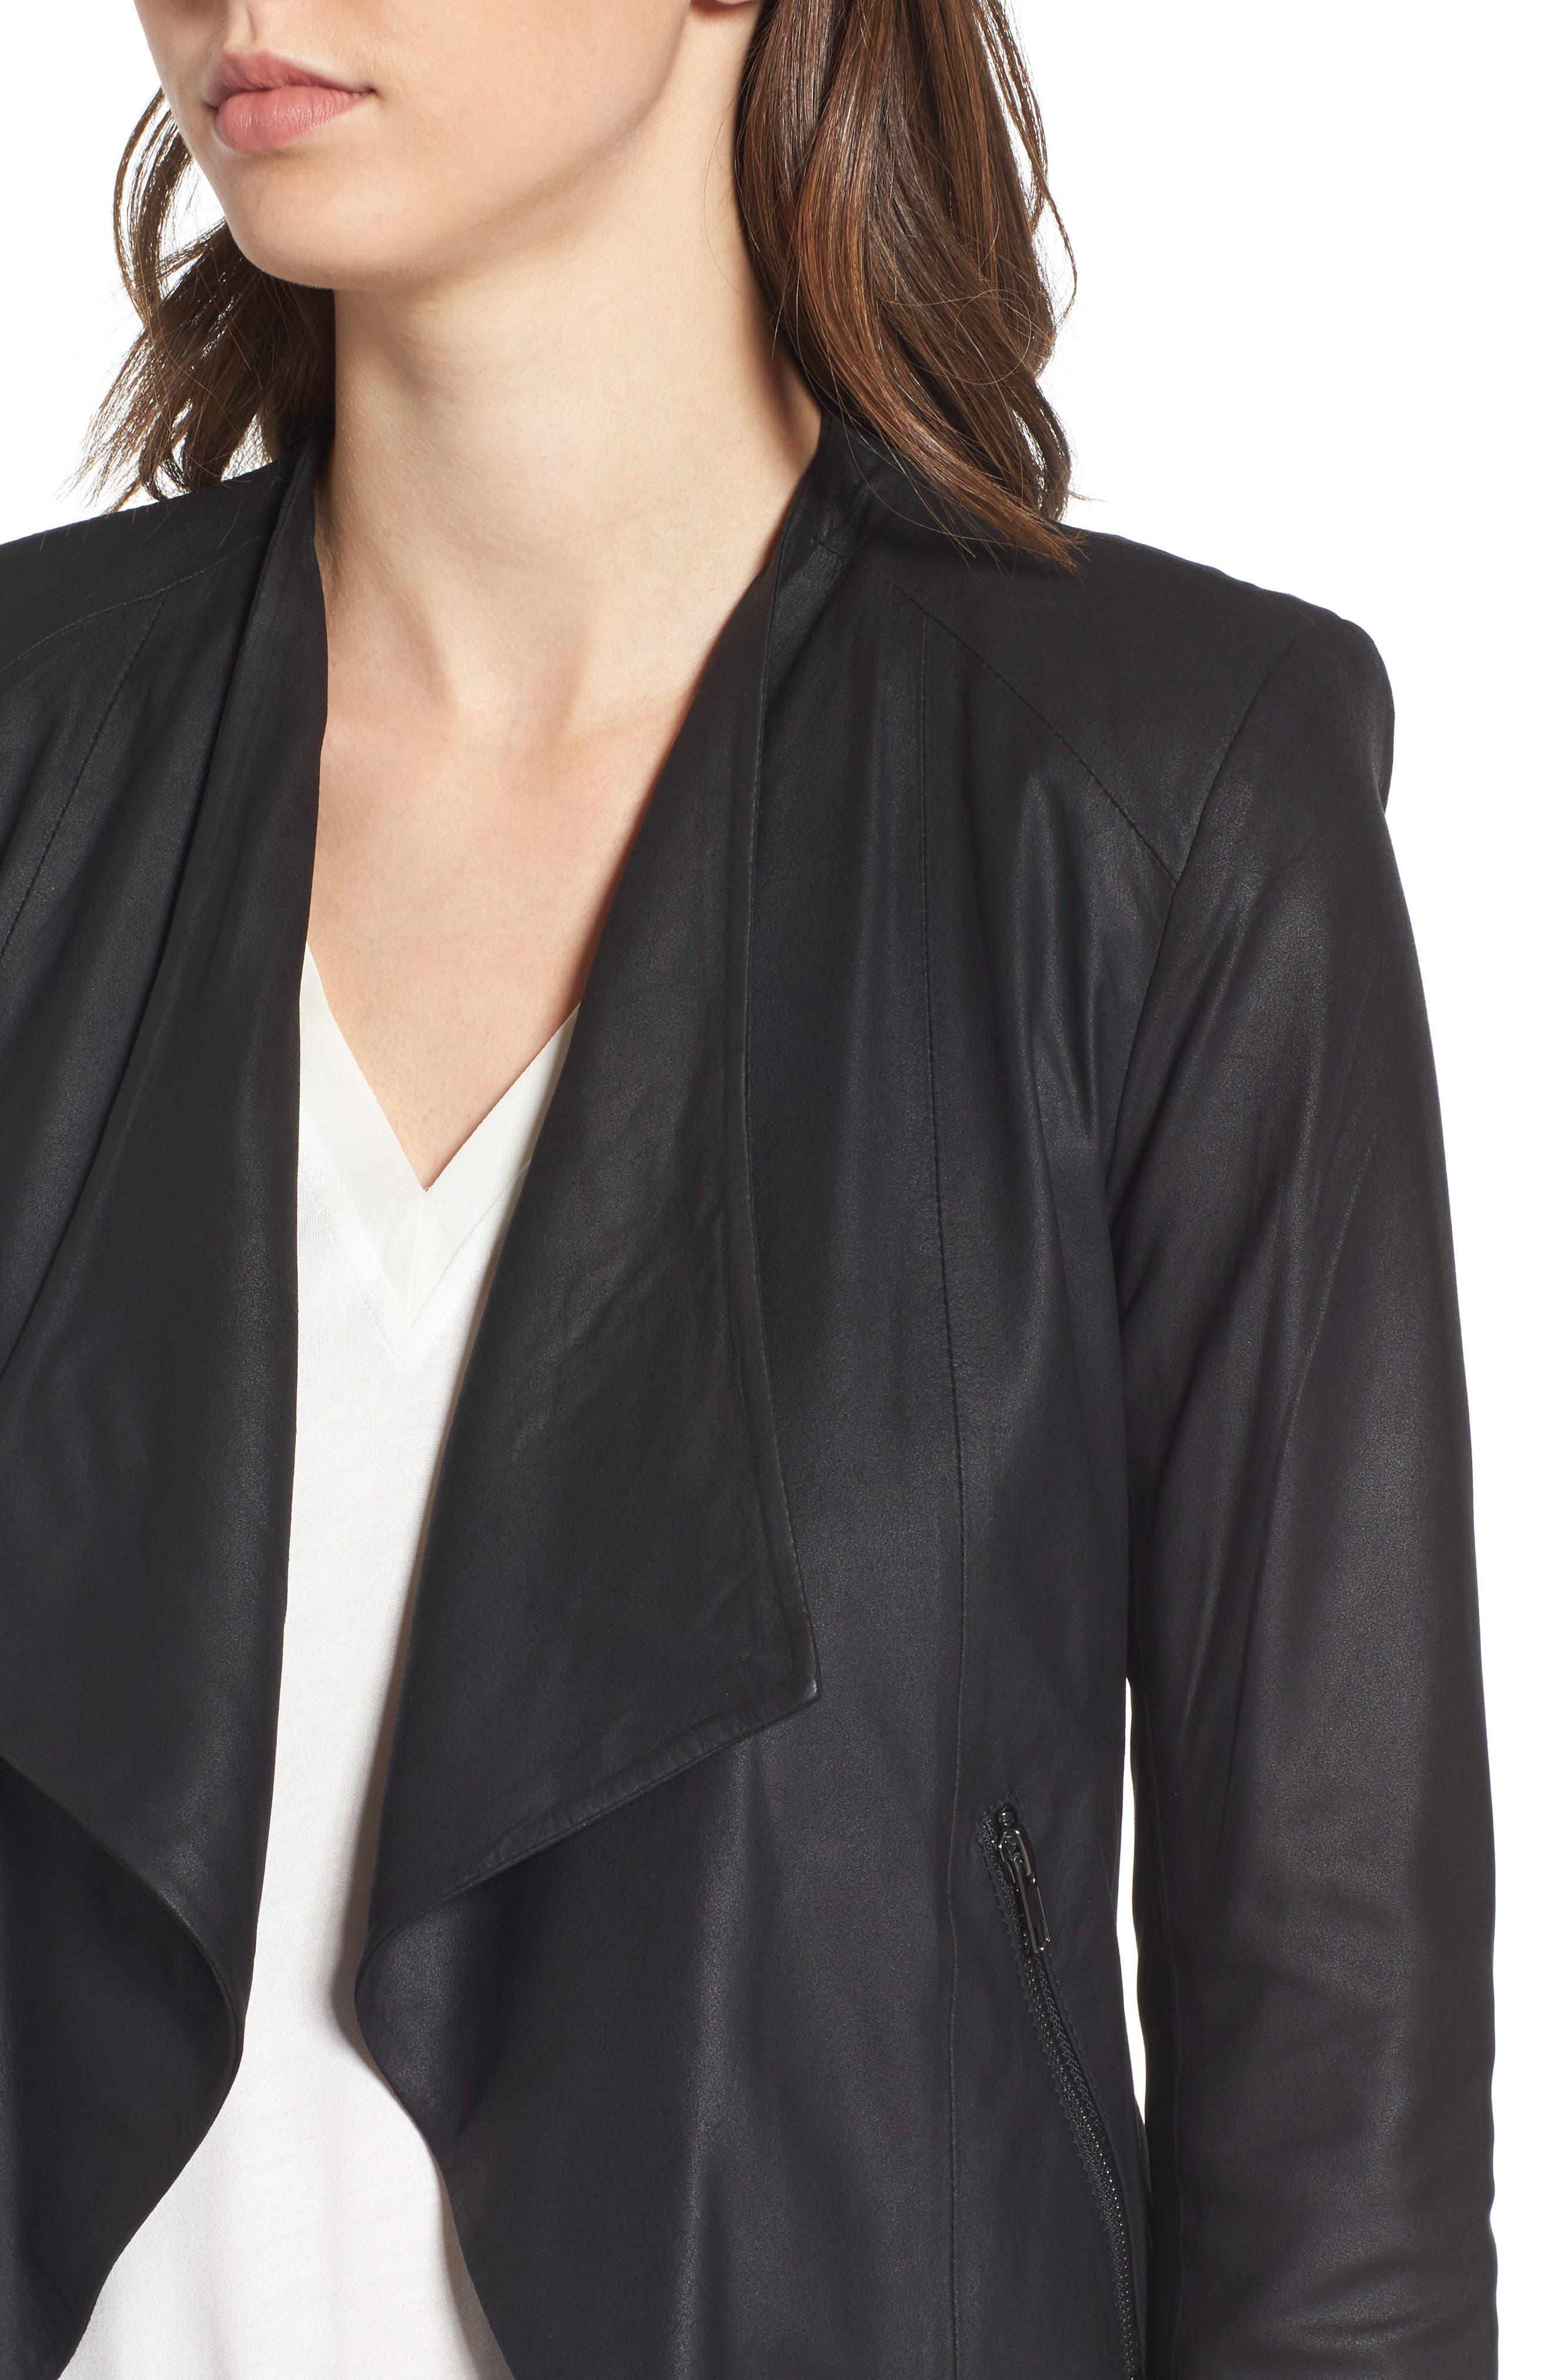 Brycen Leather Drape Front Jacket,                             Alternate thumbnail 4, color,                             001